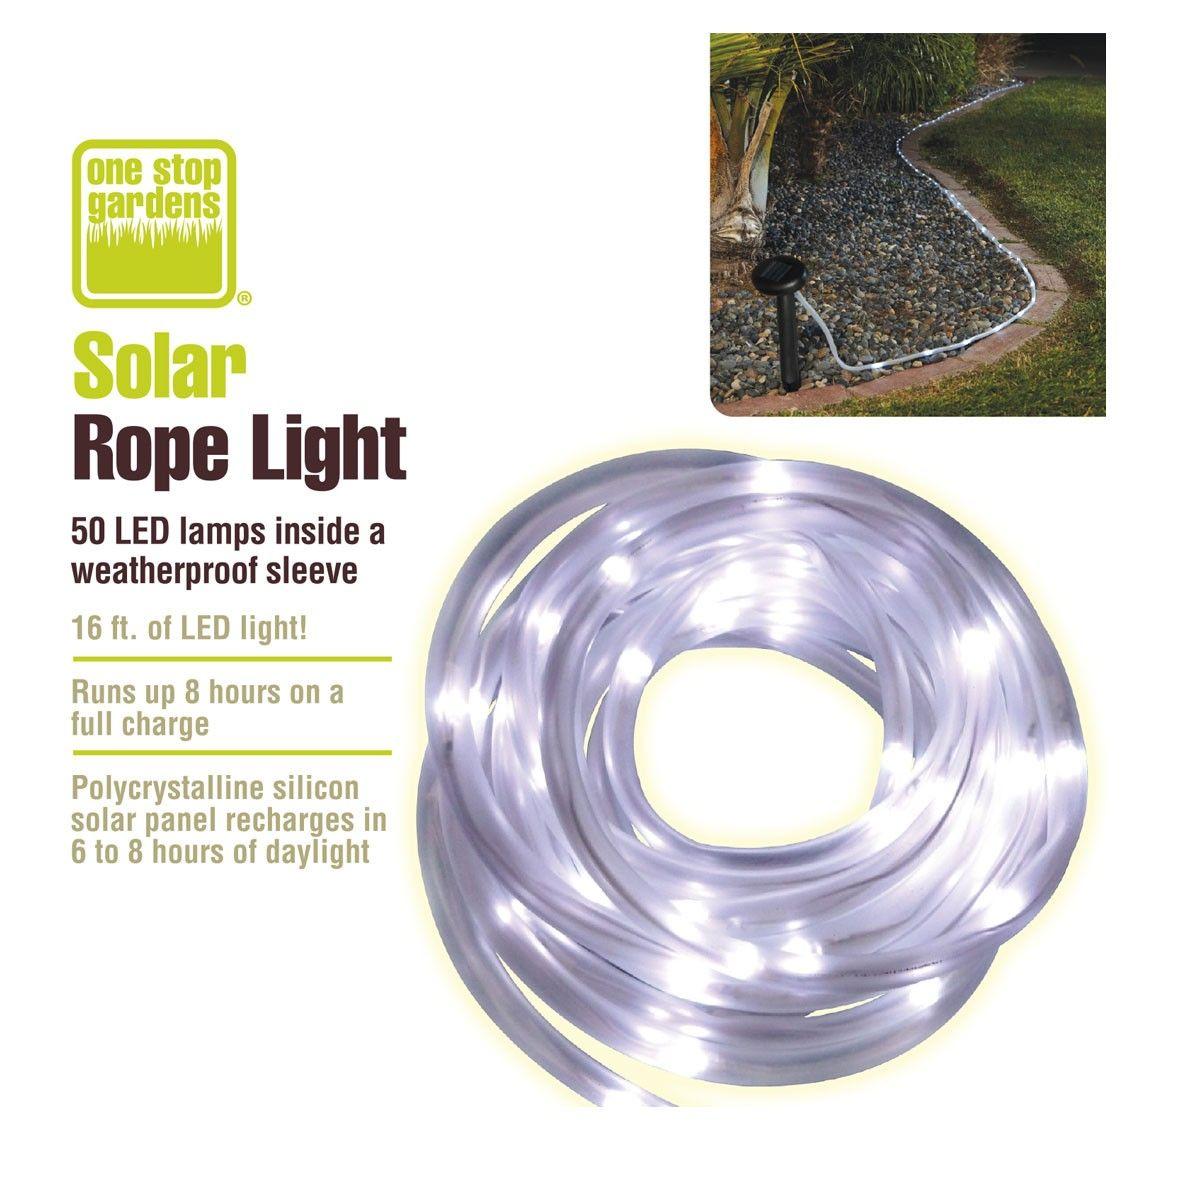 Solar rope light rope lighting homestead gardens and gardens solar rope light mozeypictures Images